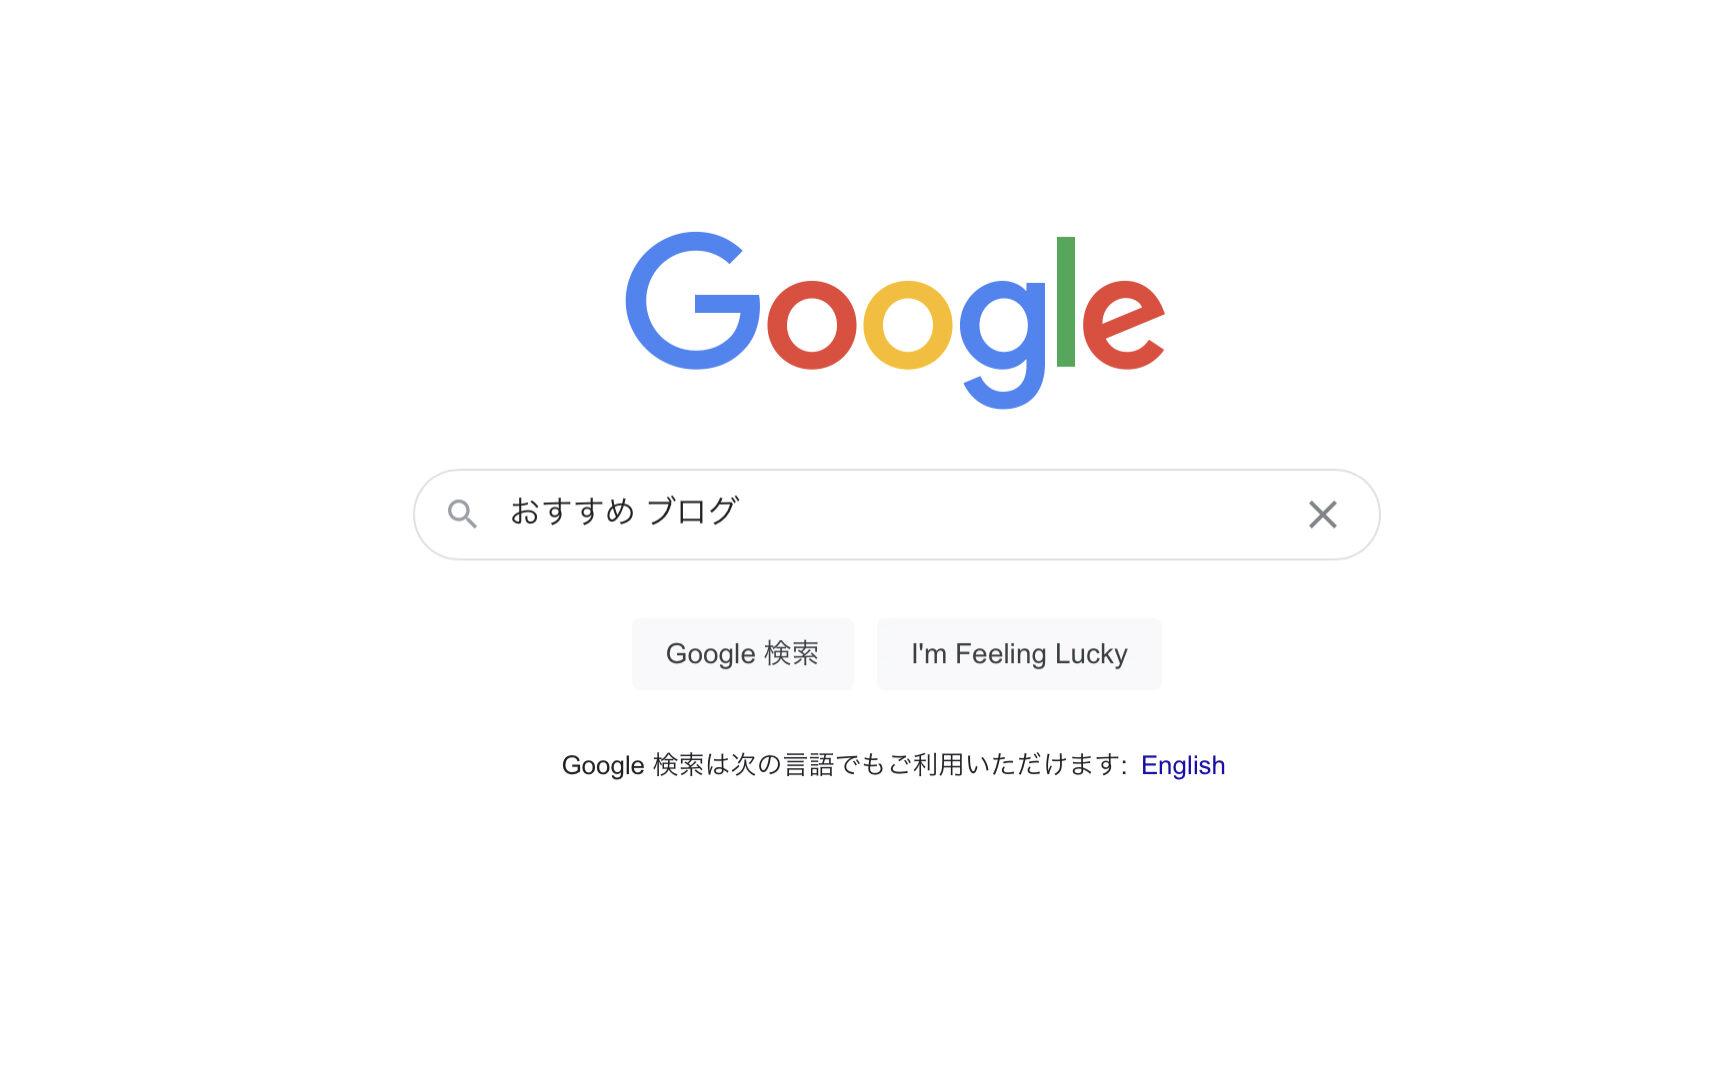 Google キャプチャ